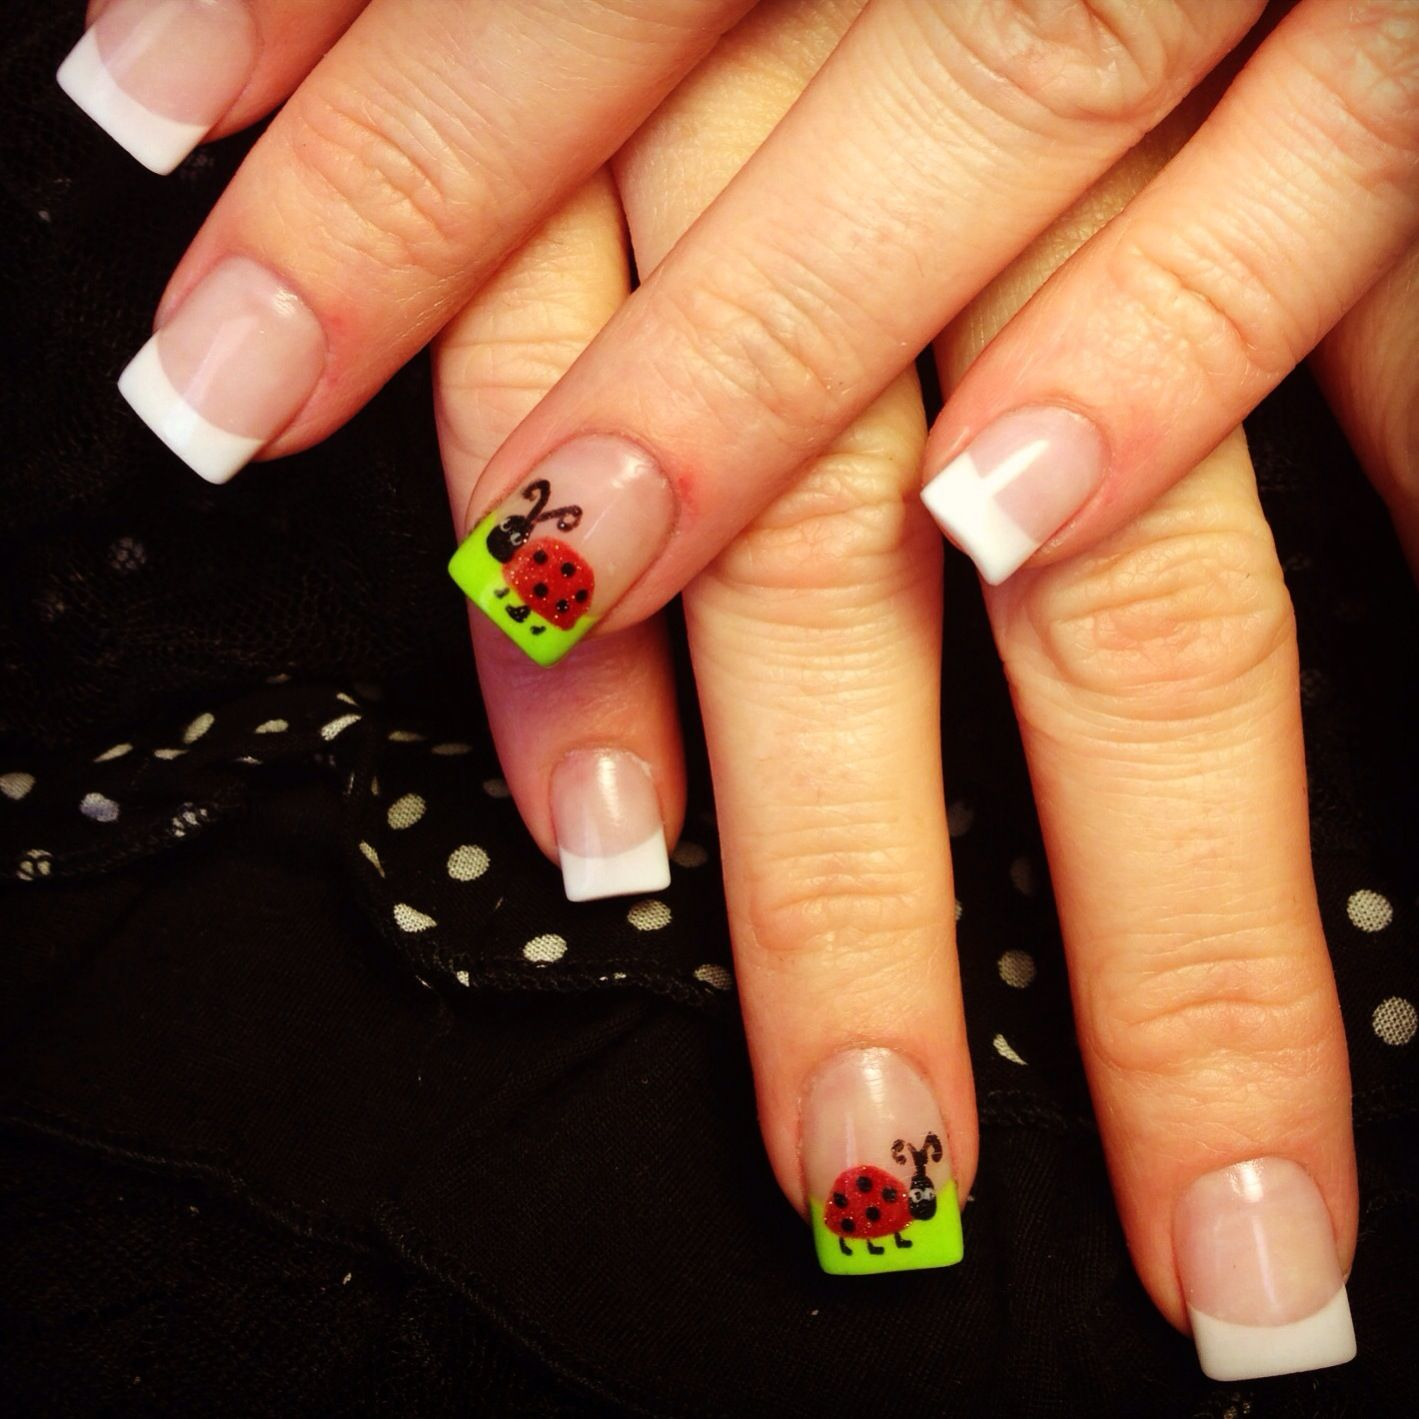 ladybug nail art. loving simplicity